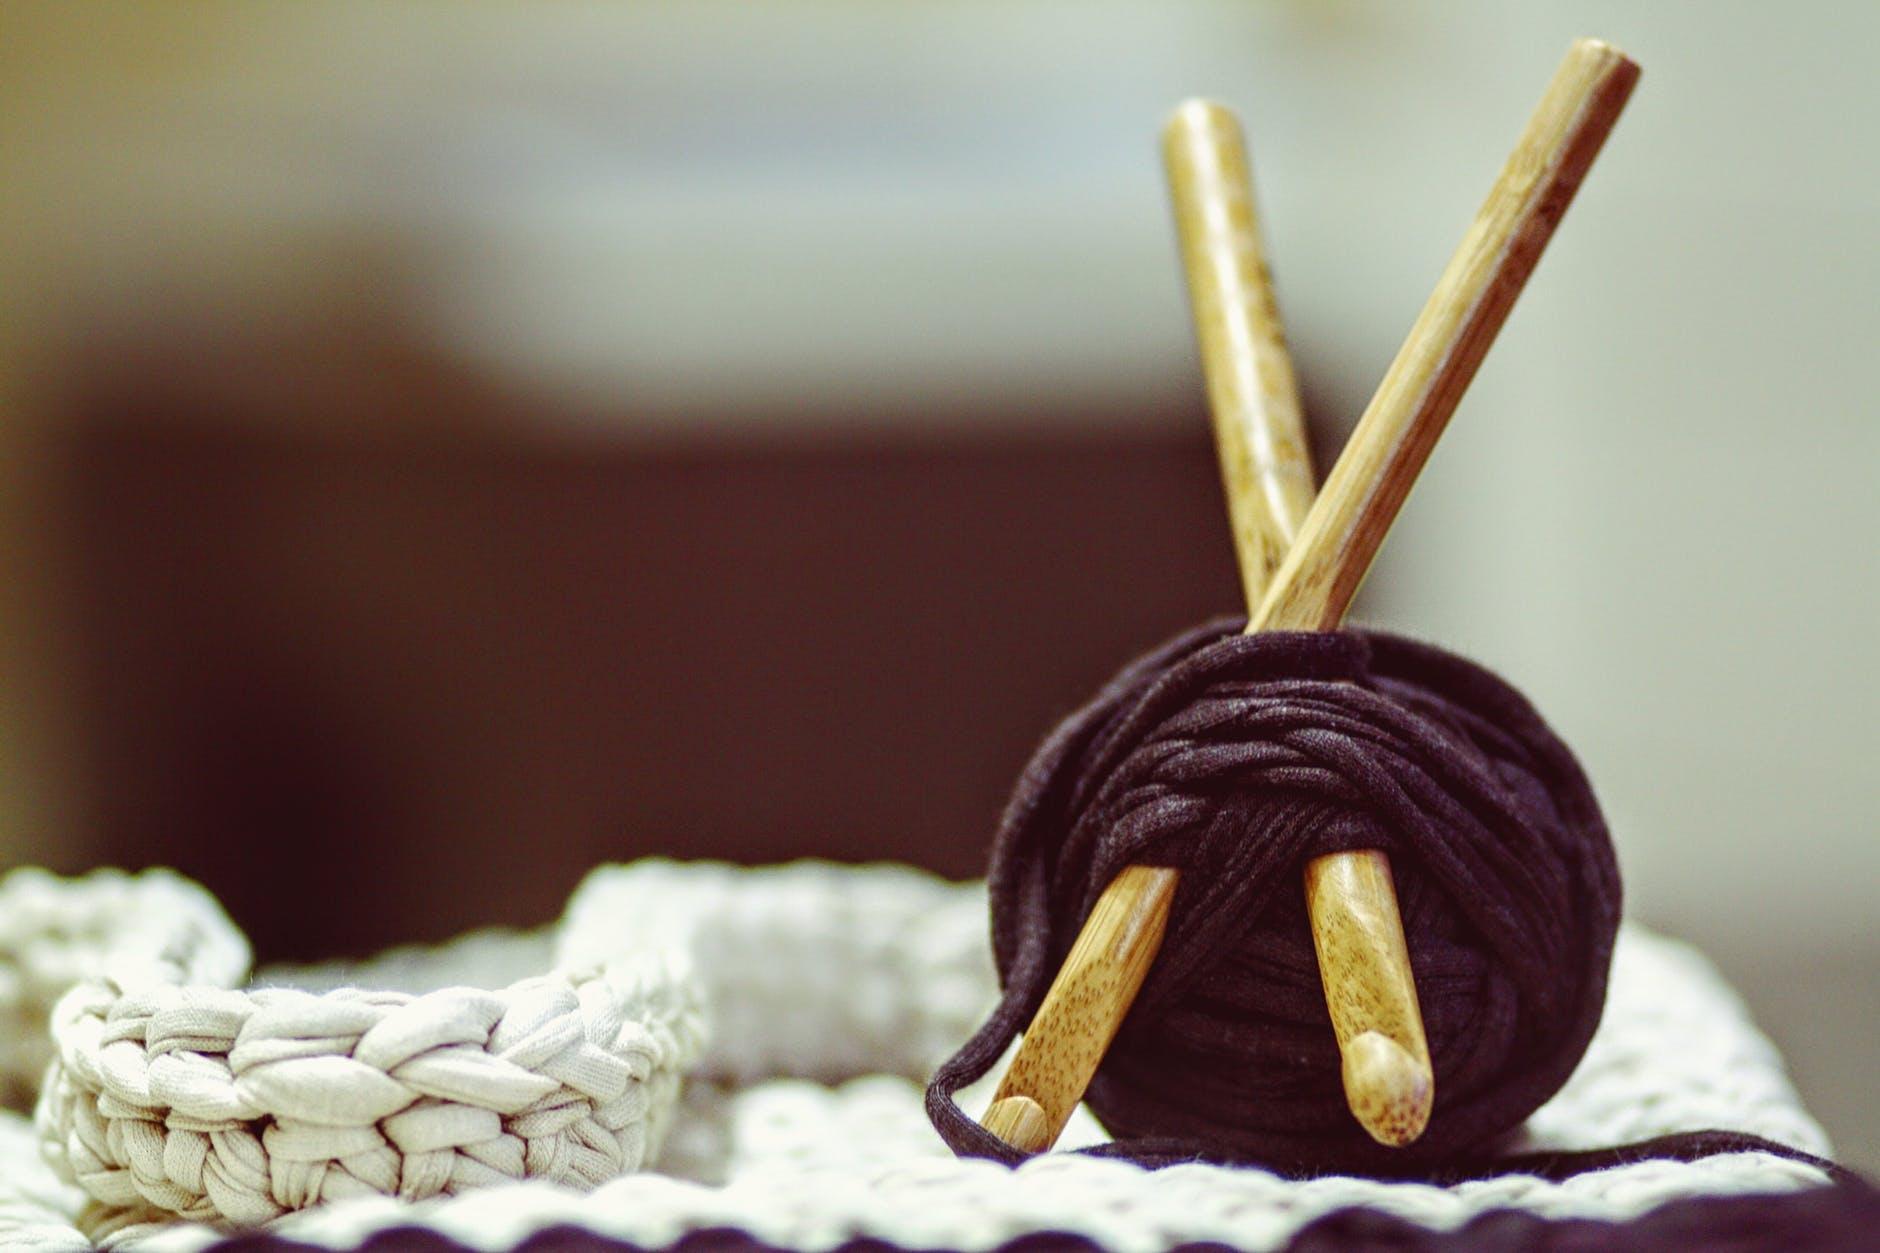 Selling Knitting Patterns Online